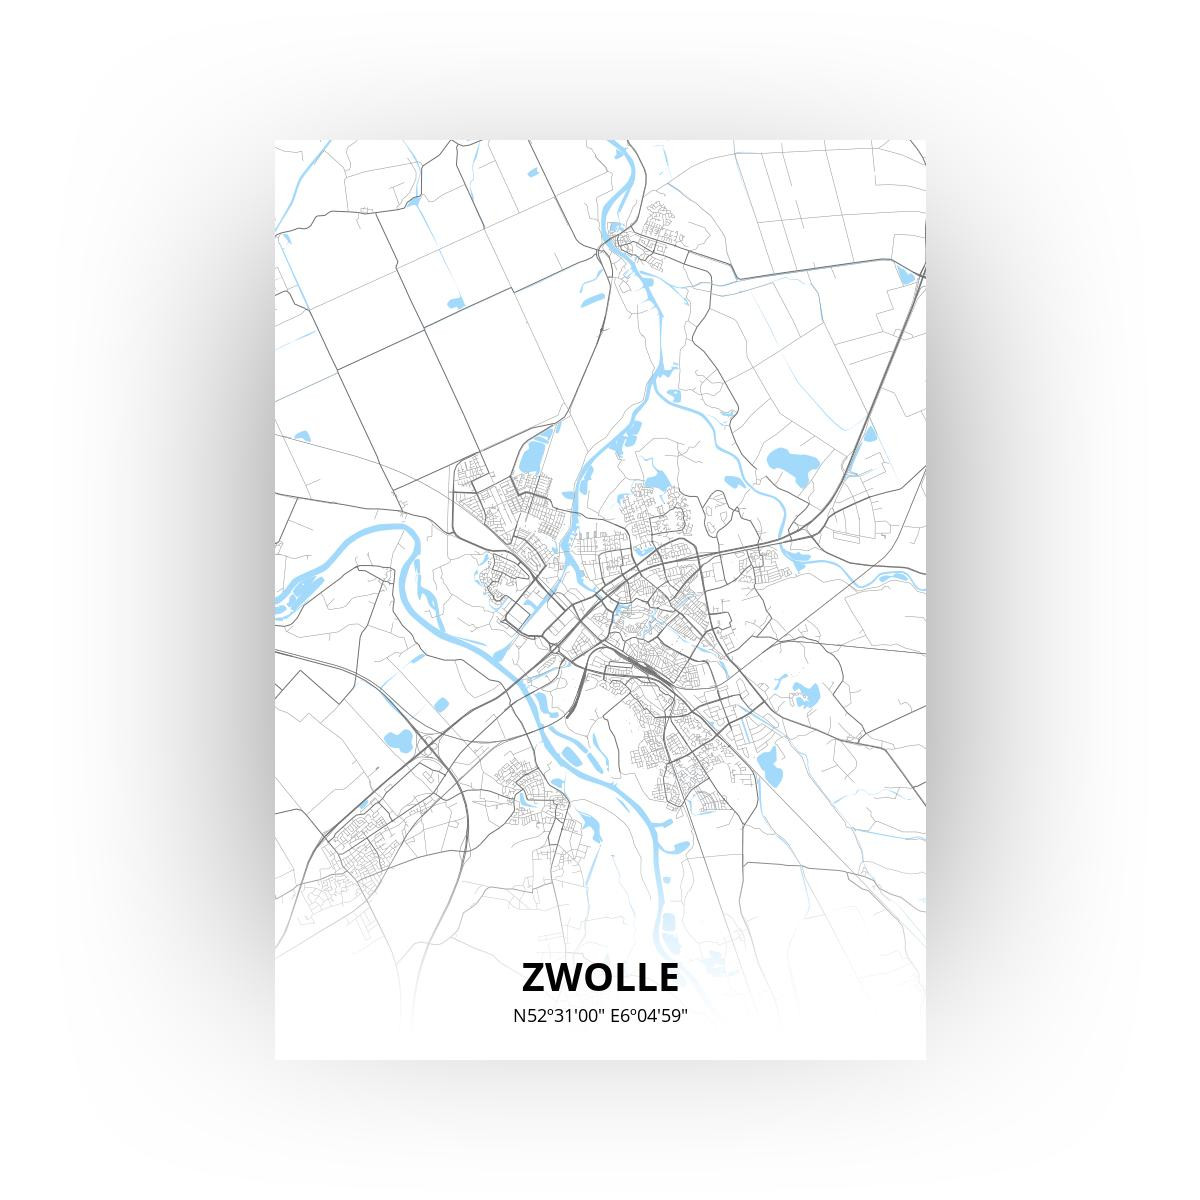 Zwolle print - Standaard stijl